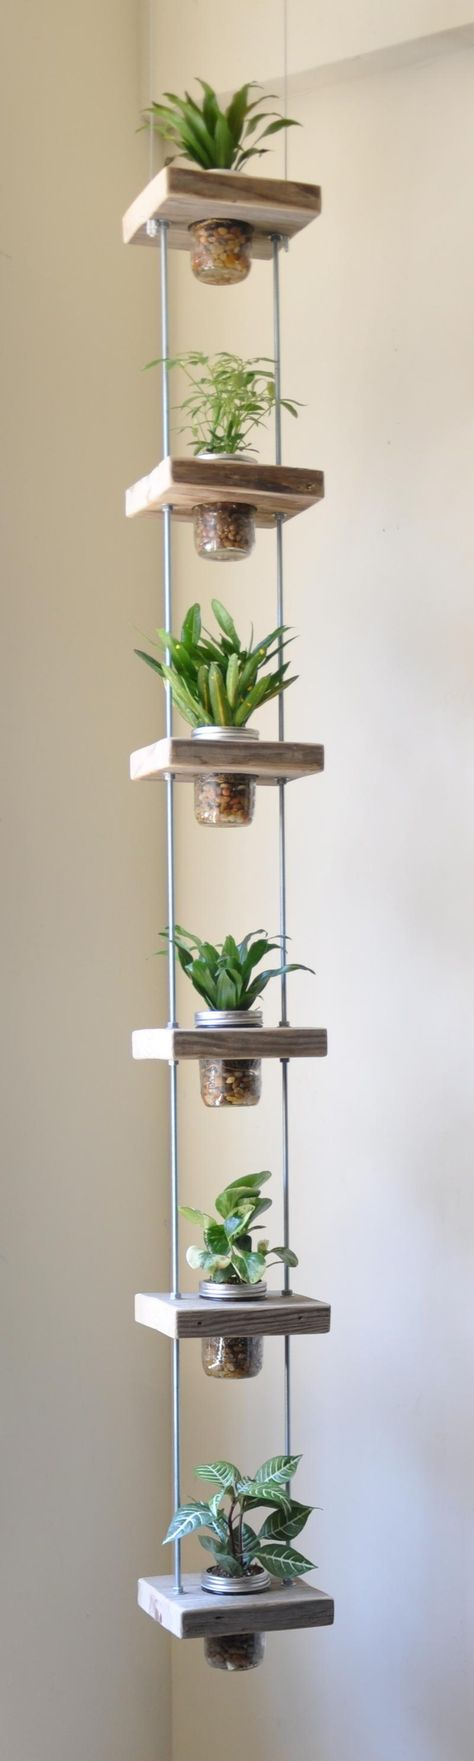 Make It: Vertical Mason Jar Herb Garden - Tutorial #home